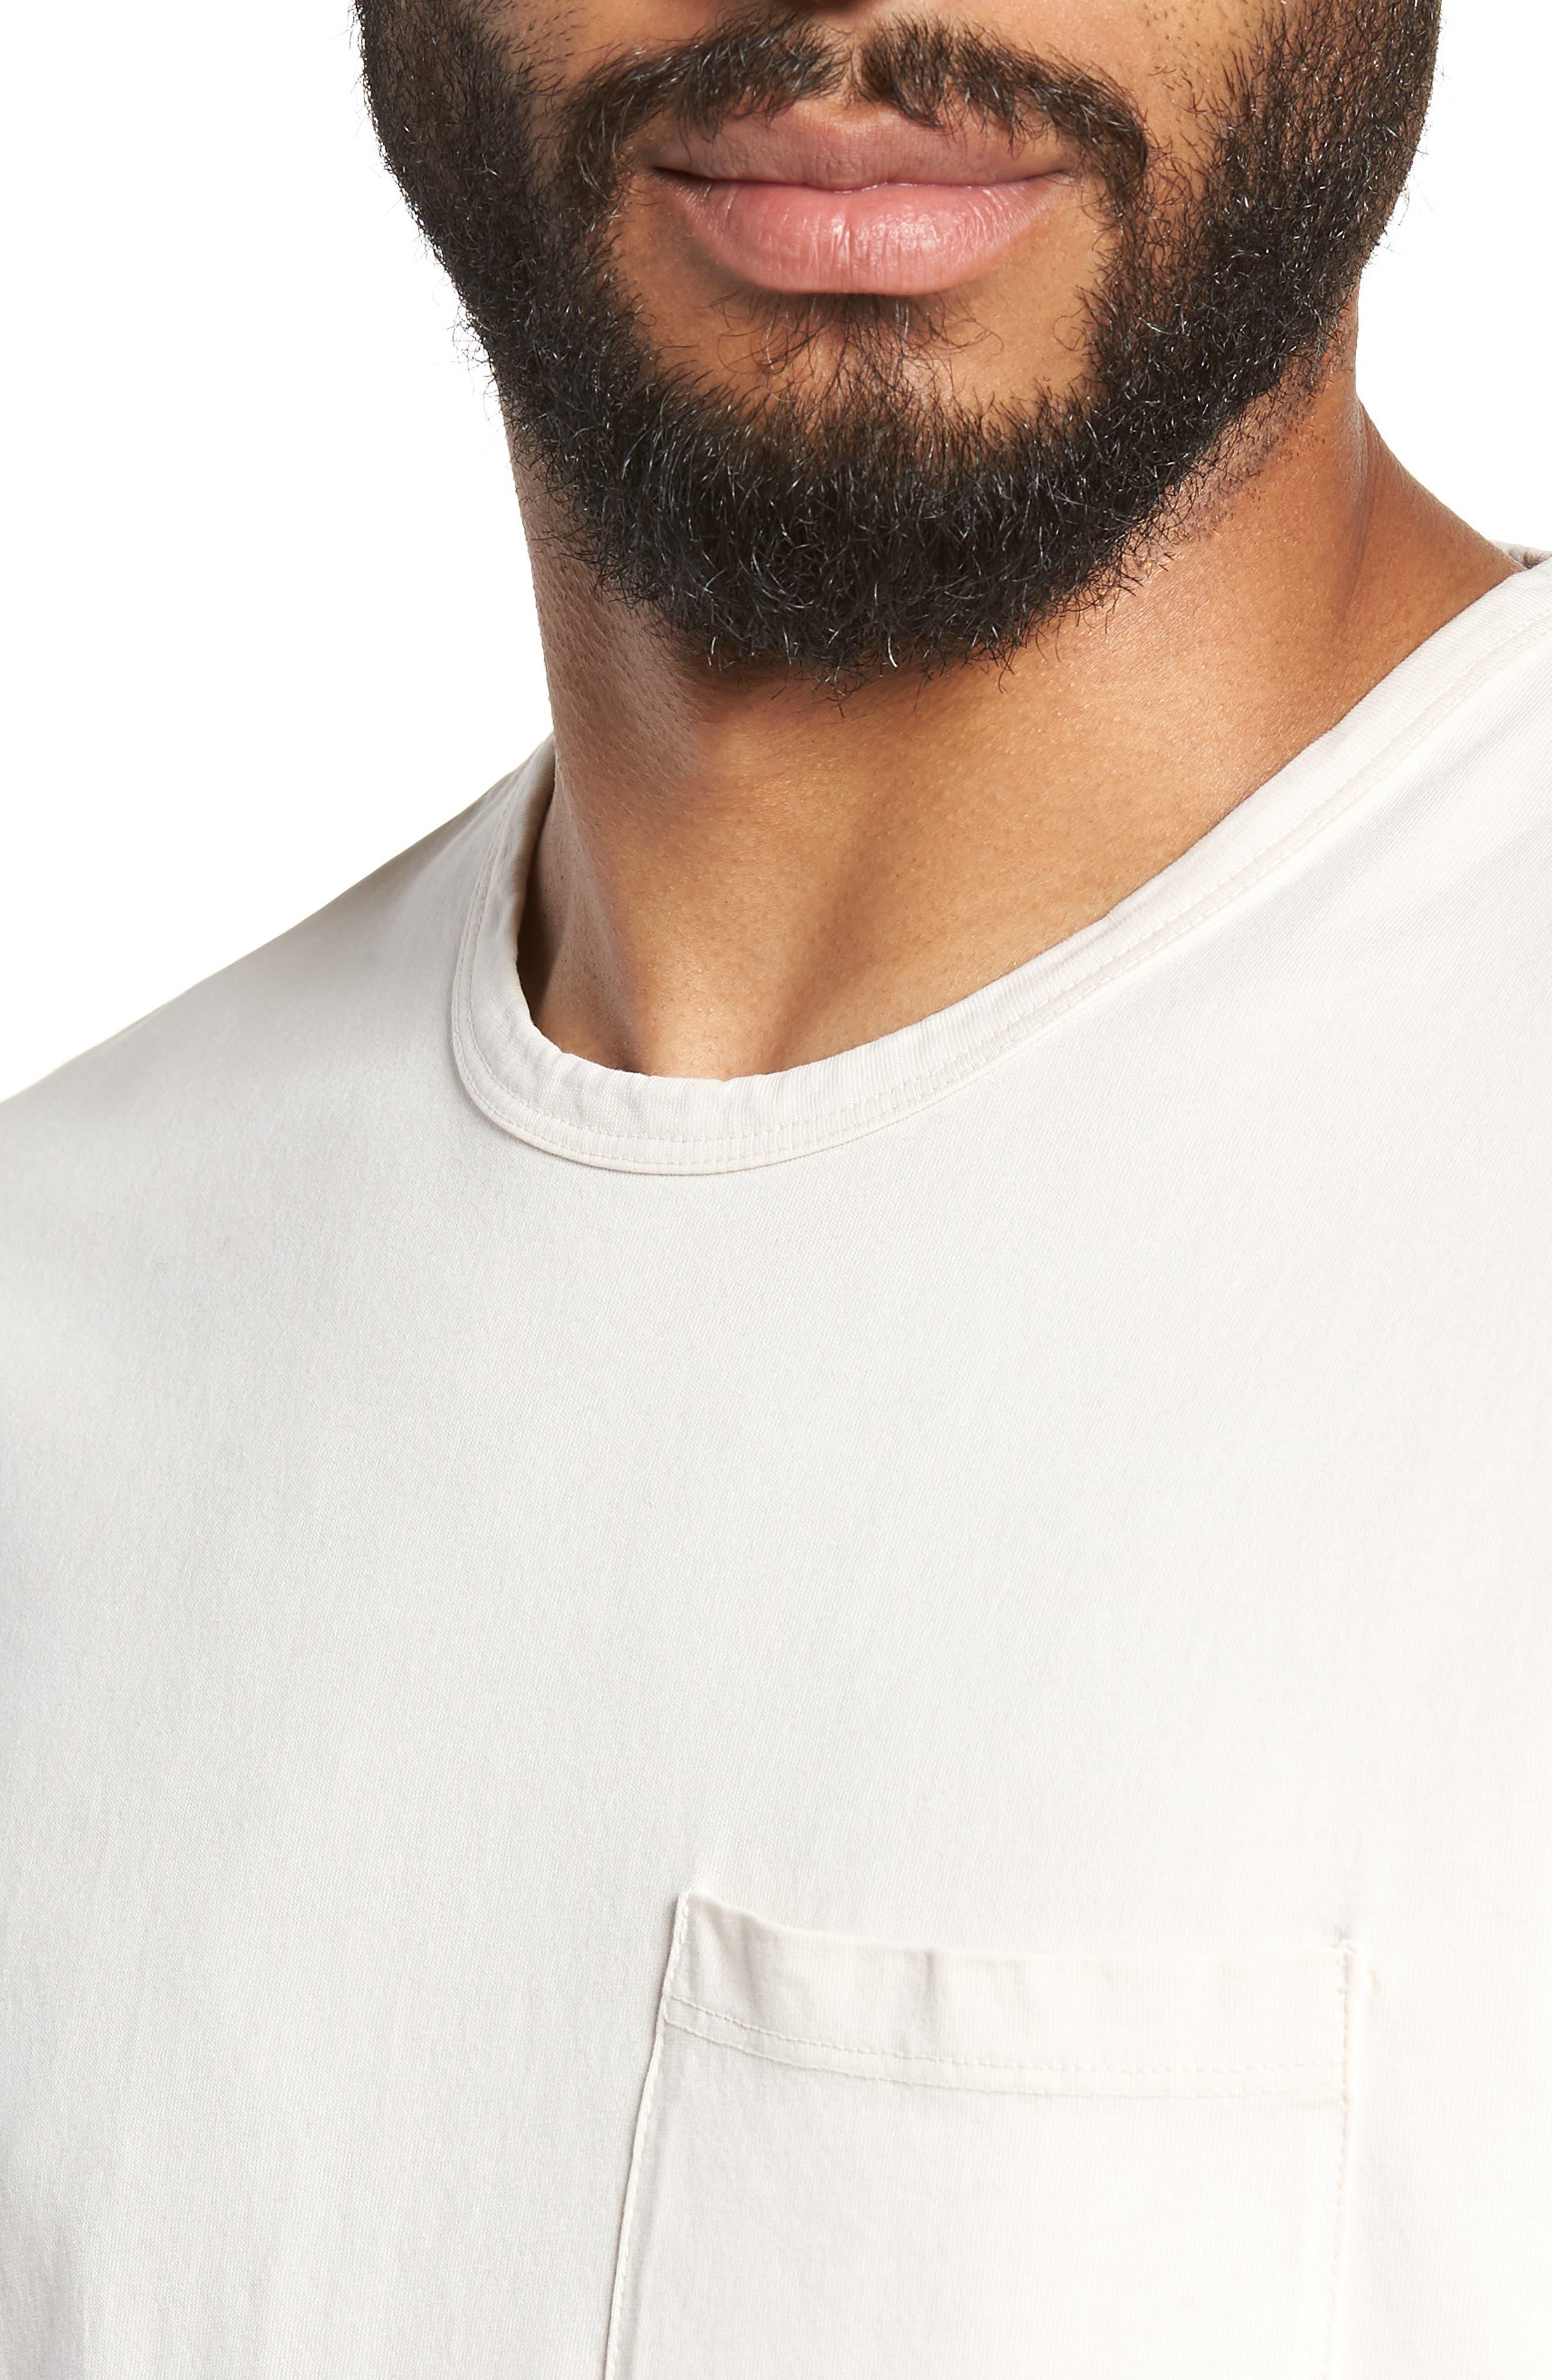 Regular Fit Garment Dye Pocket T-Shirt,                             Alternate thumbnail 4, color,                             SAIL